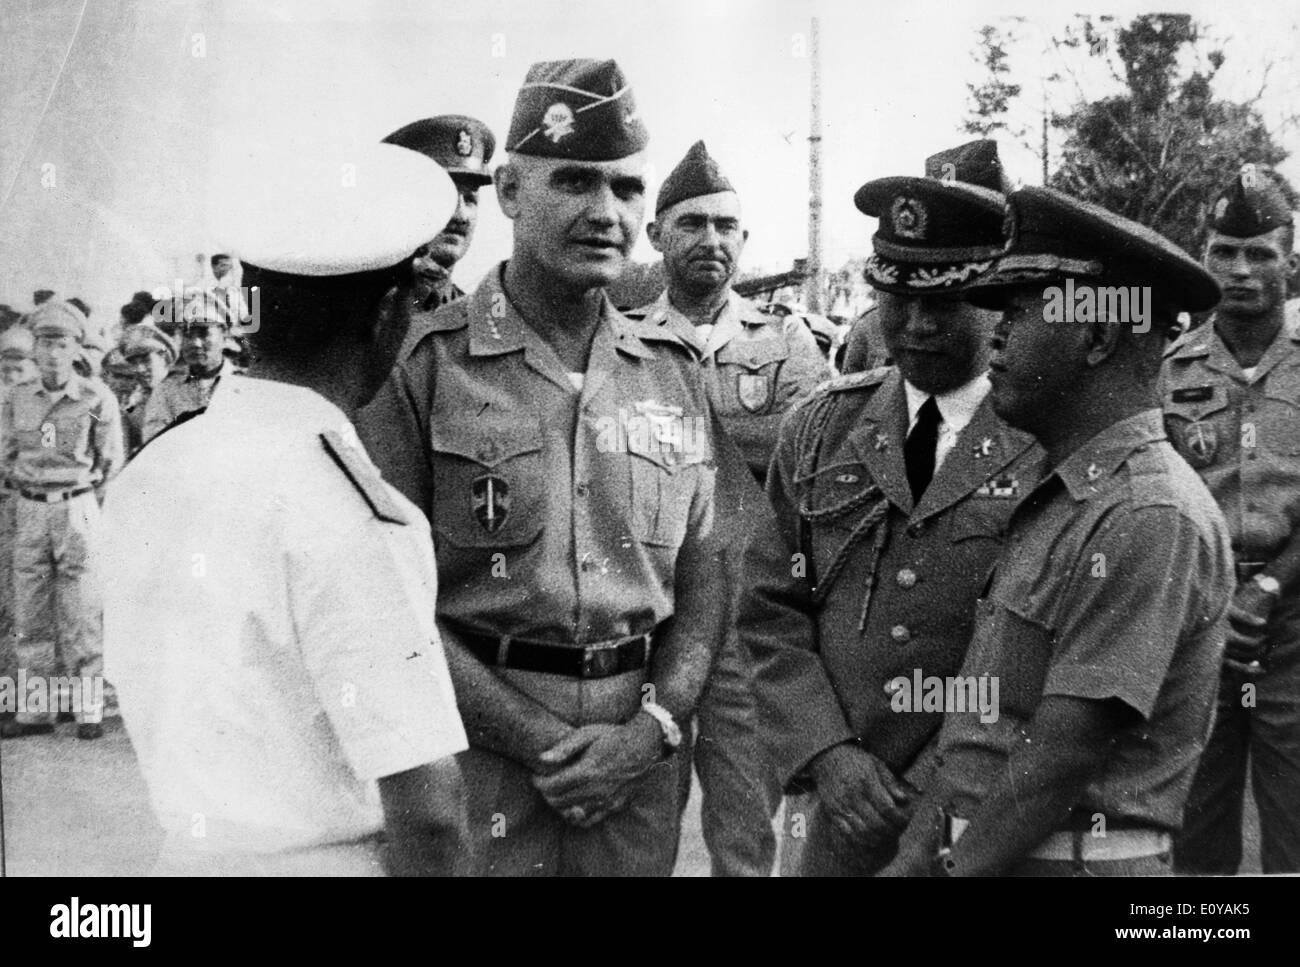 Sep 15, 1969; London, England, UK; U.S. Army General WILLIAM WESTMORELAND (1914-2005) while talking to Major DAVID FAULKNER - Stock Image